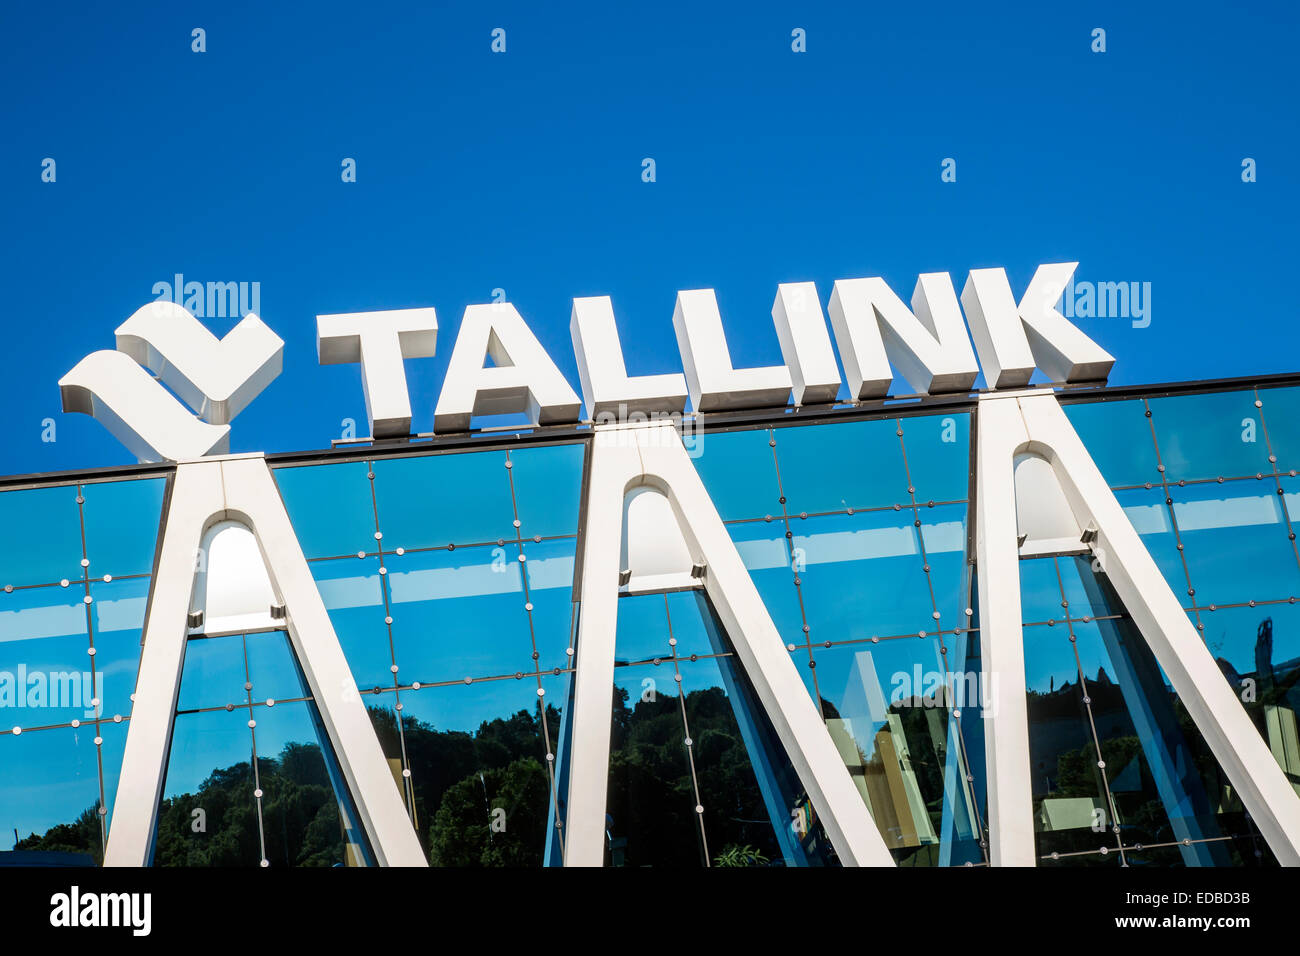 Headquarters of the Estonian shipping company Tallink, Tallinn, Estonia - Stock Image